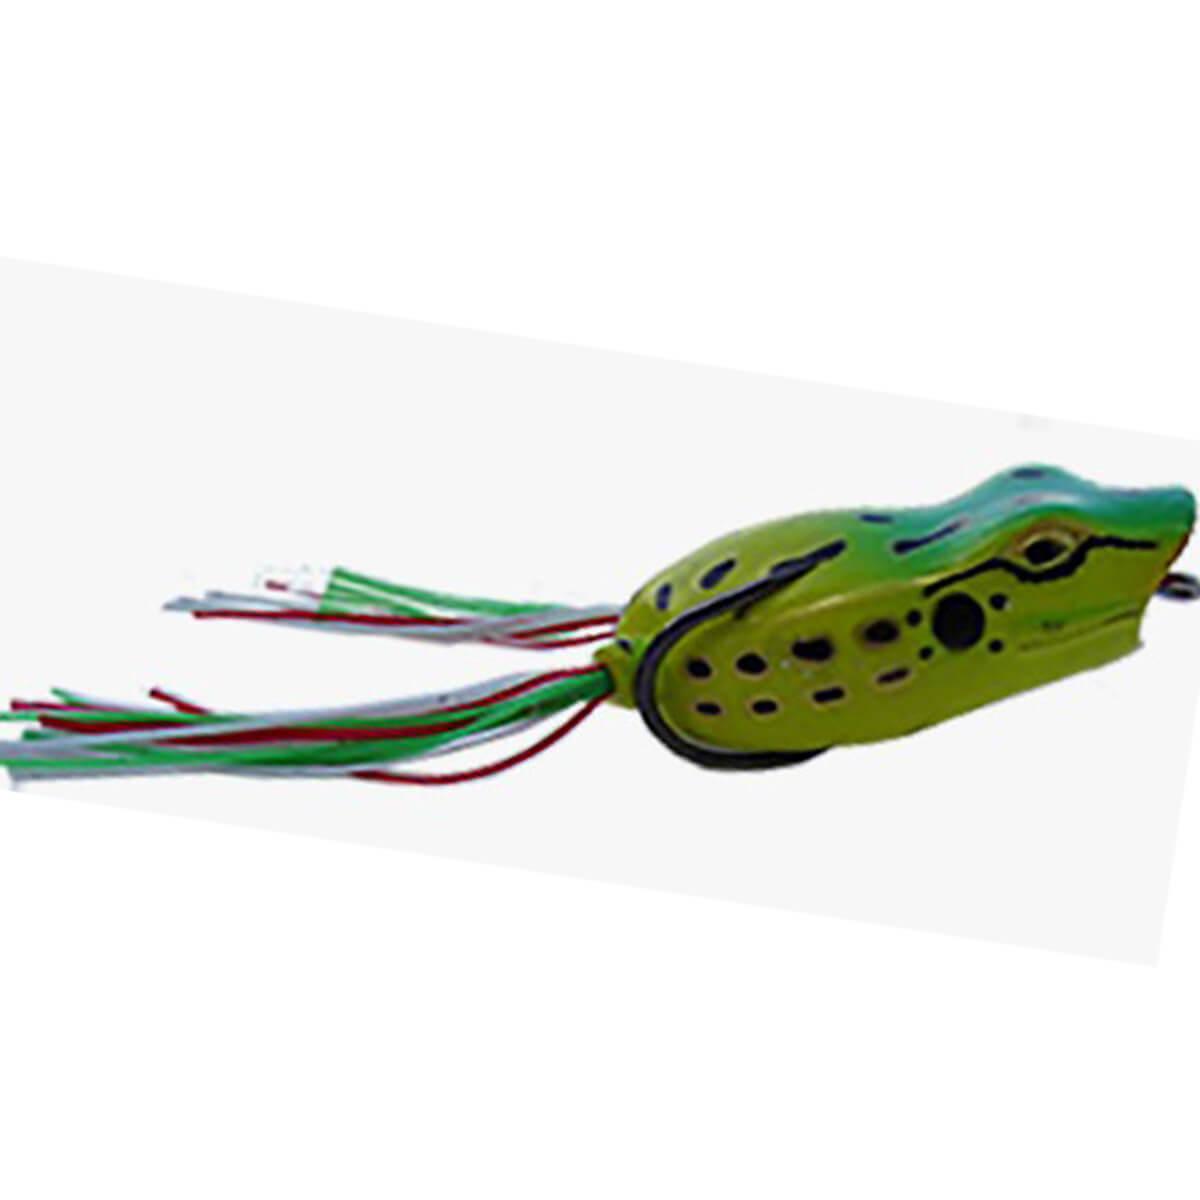 Isca Artificial Lizard Popper Frog 5,5cm 15gr